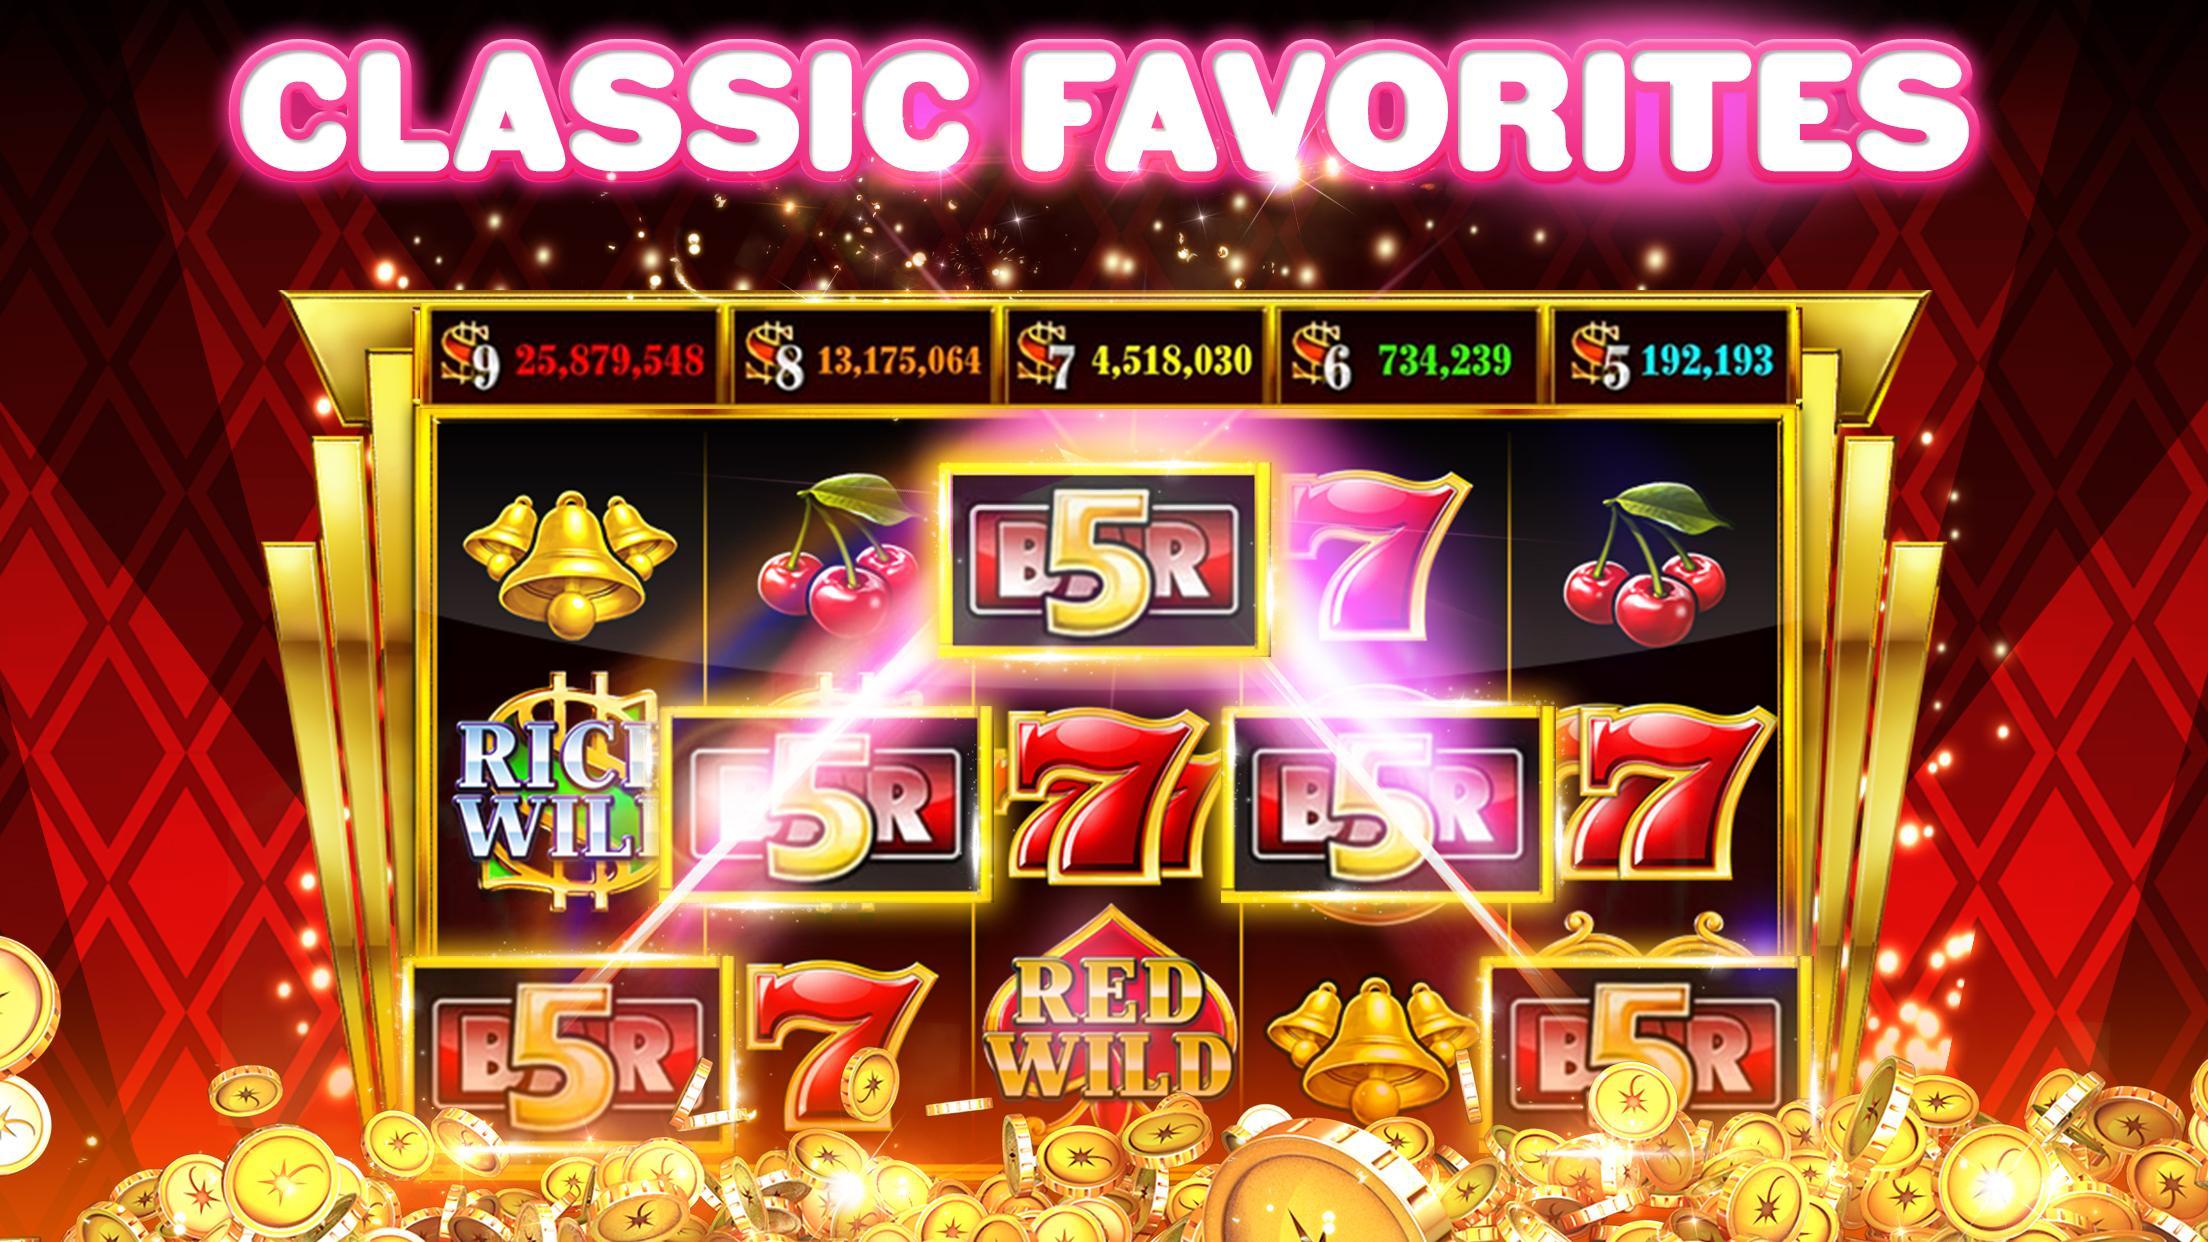 Jackpotjoy Slots Slot machines with Bonus Games 26.0.05 Screenshot 2